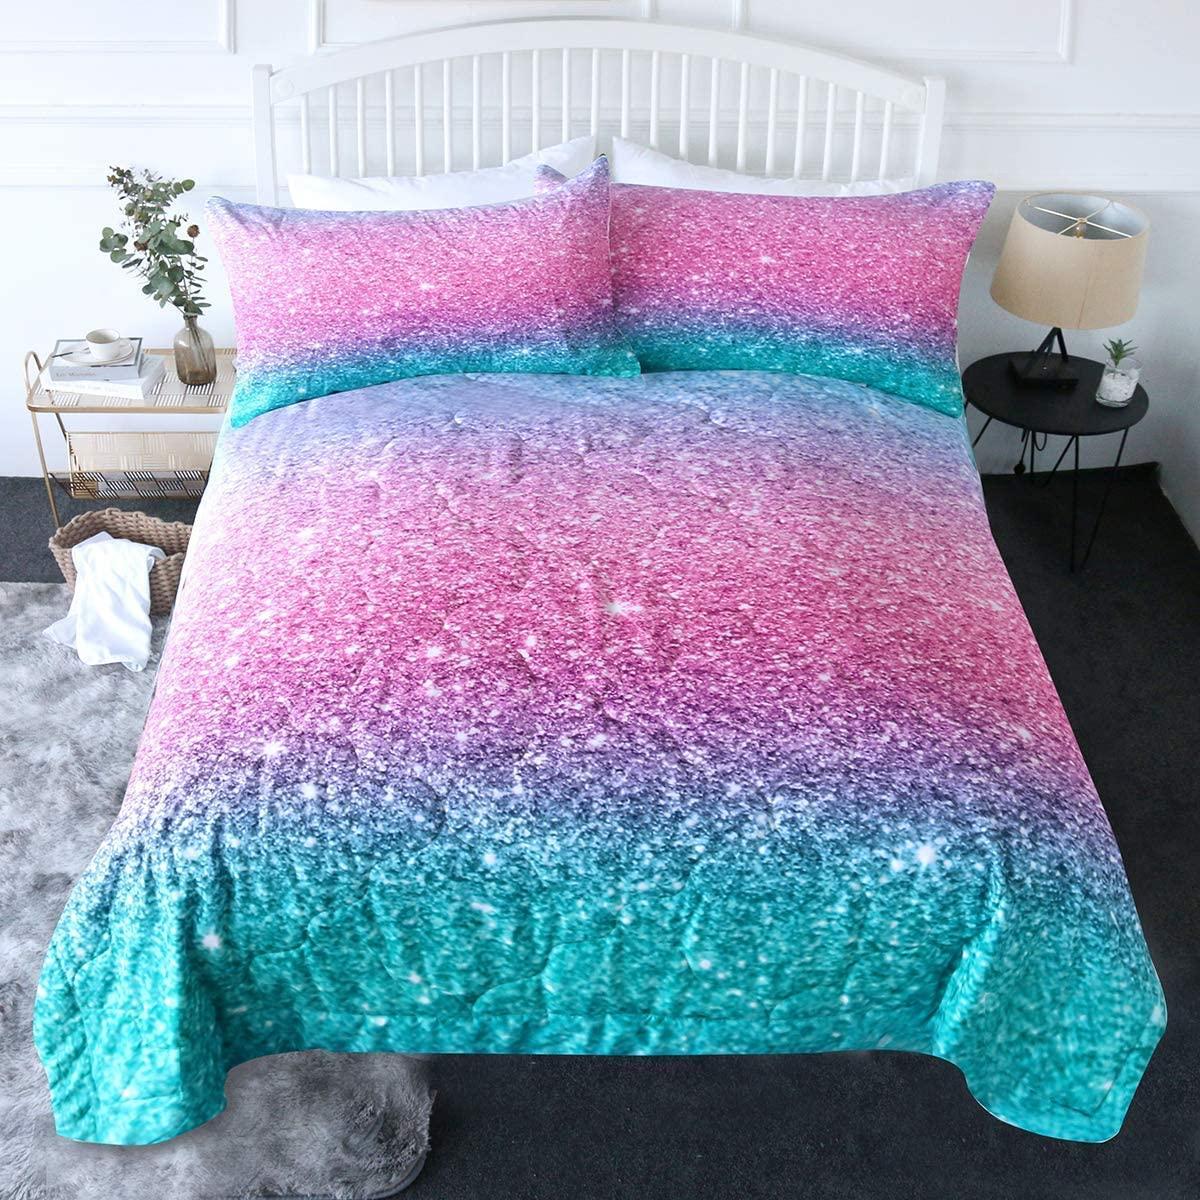 BlessLiving 3 Piece Comforter Set with Pillow Shams - 3D Pri